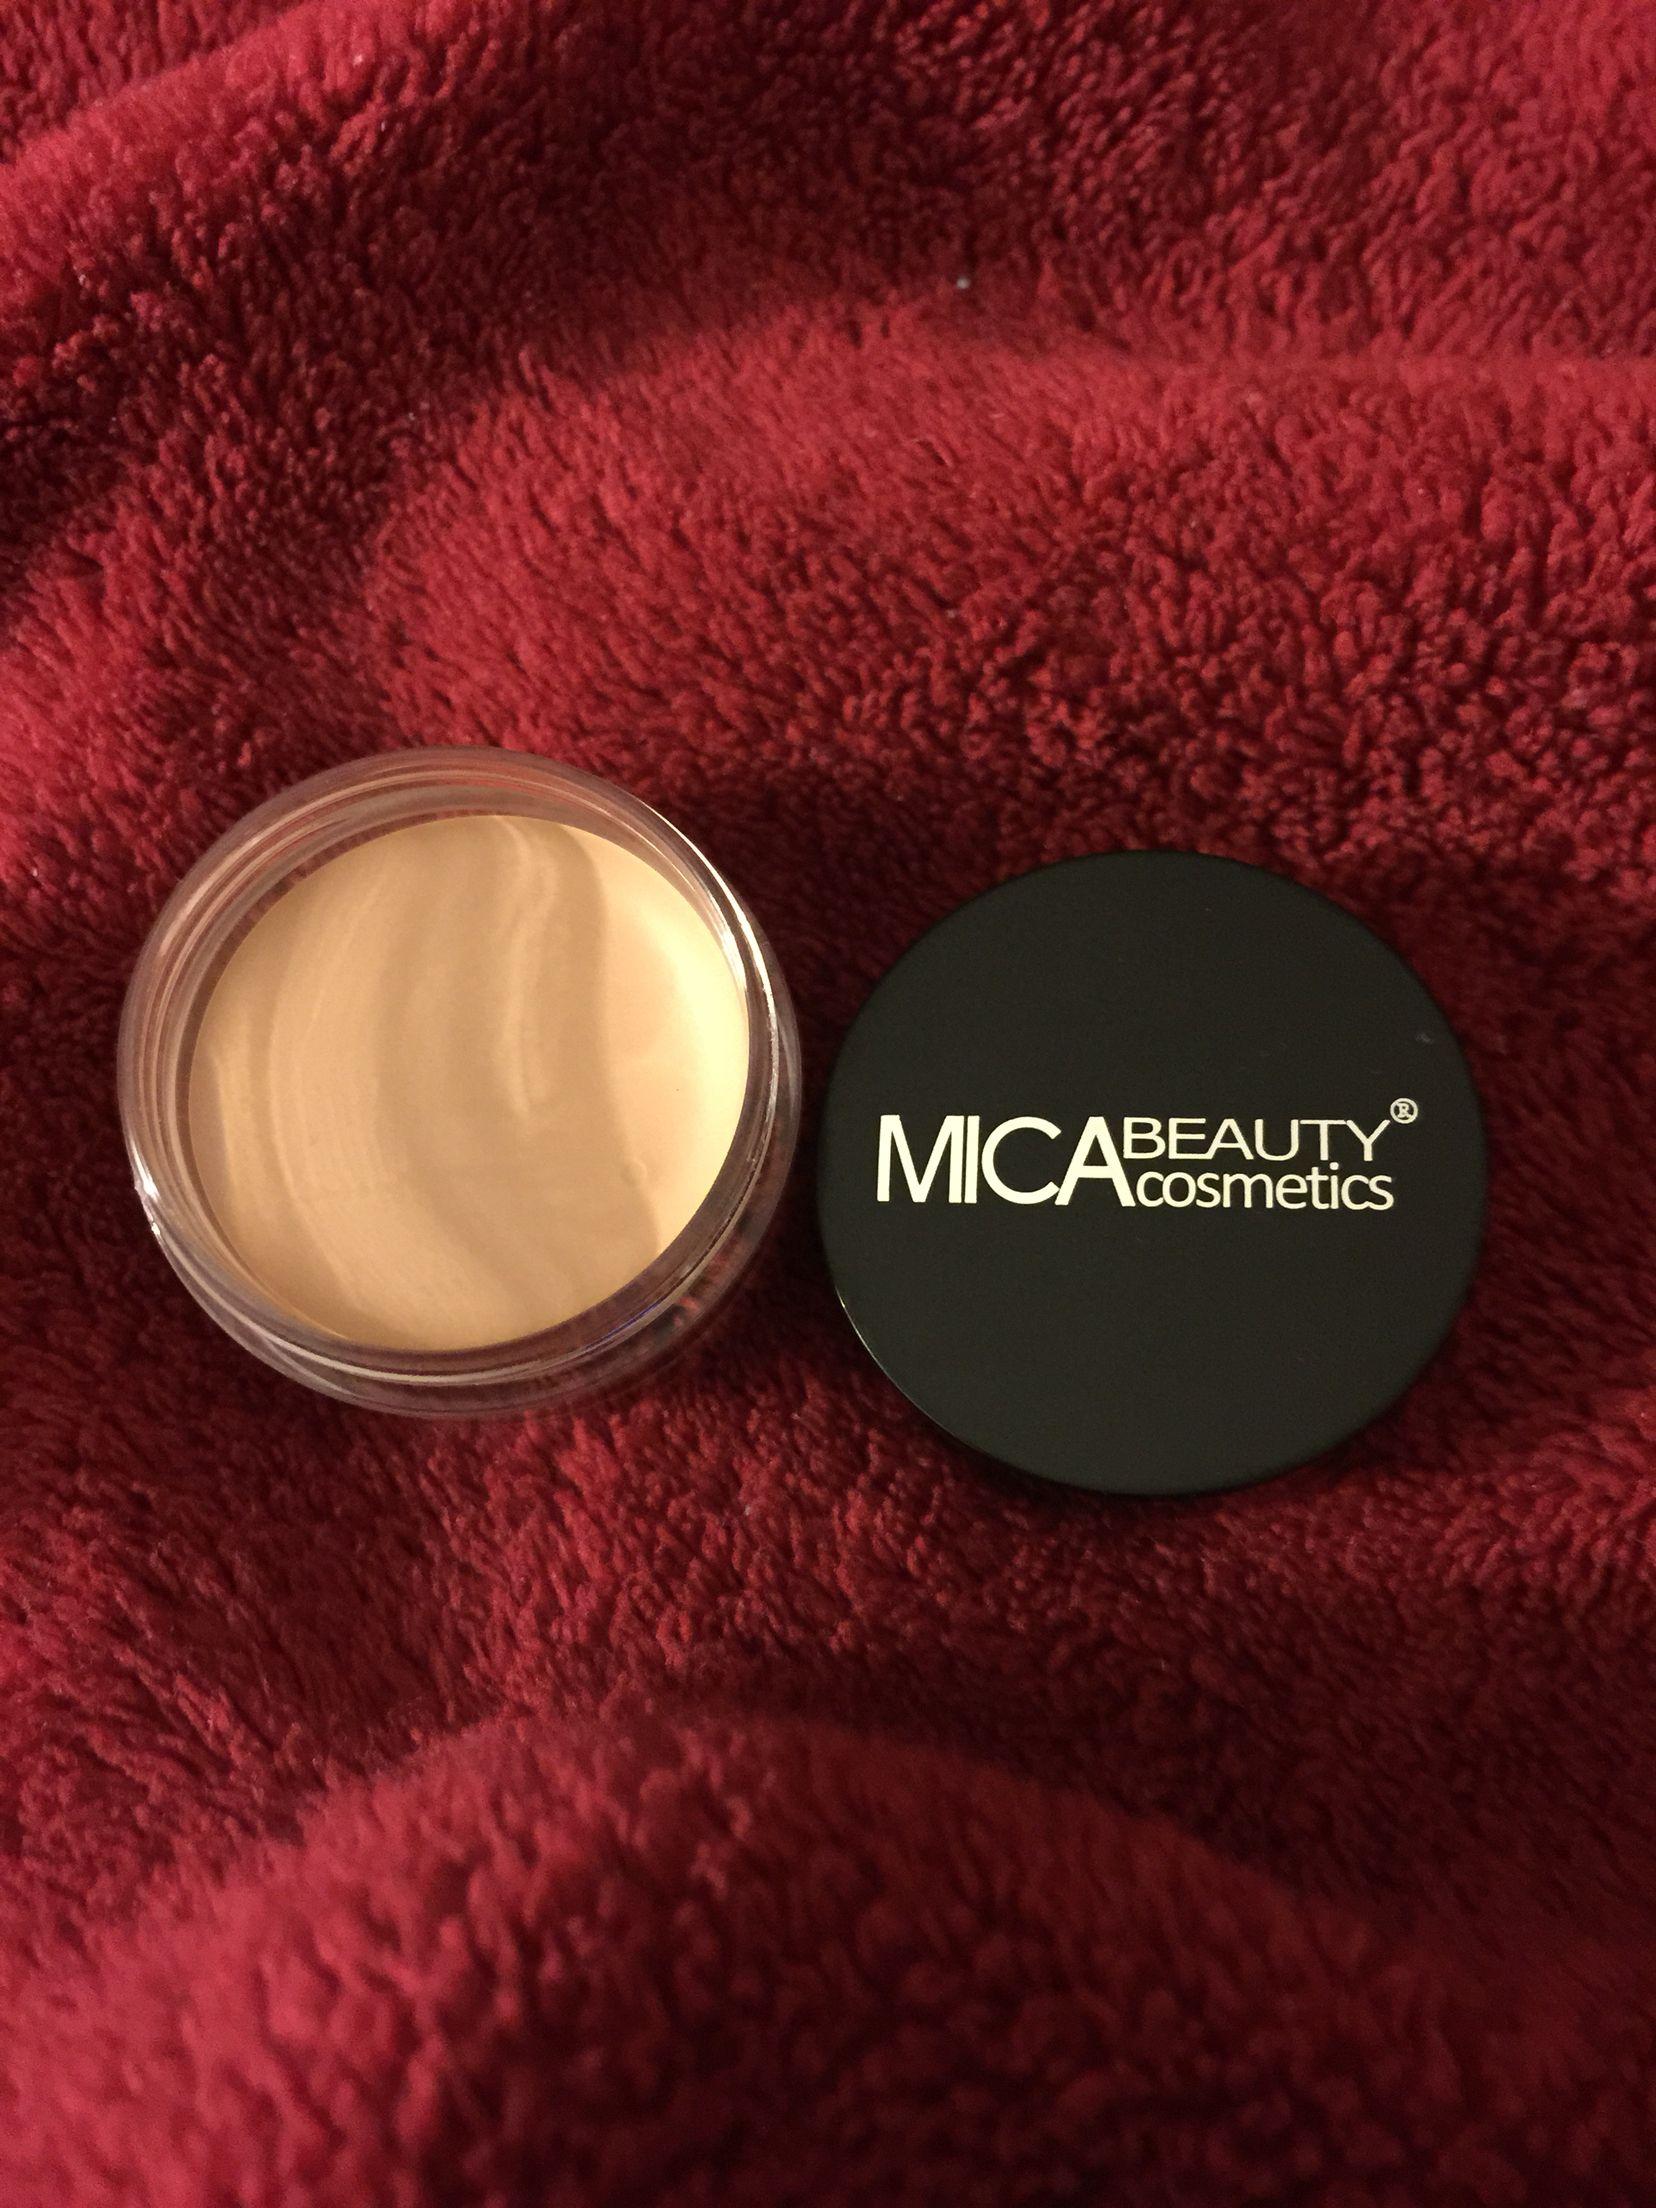 Mica Beauty Cosmetics Eye Primer Brand New Beauty